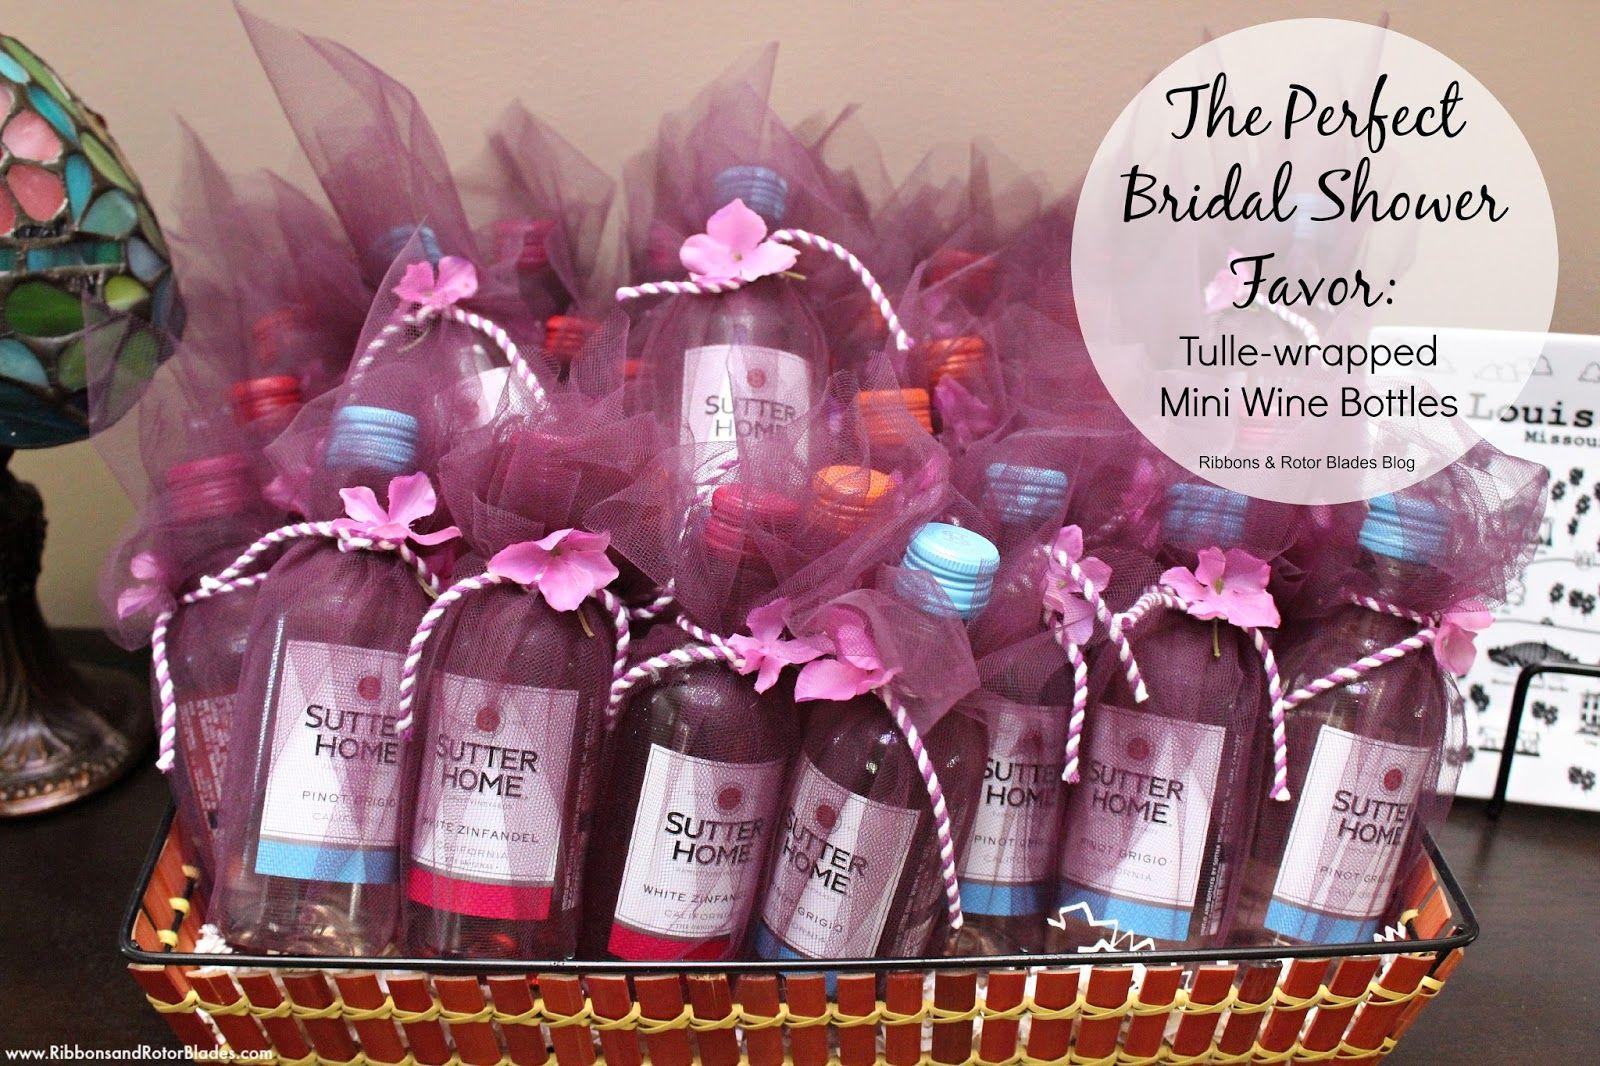 wedding shower decorations Bridal Shower Decor Favor of mini wine bottles